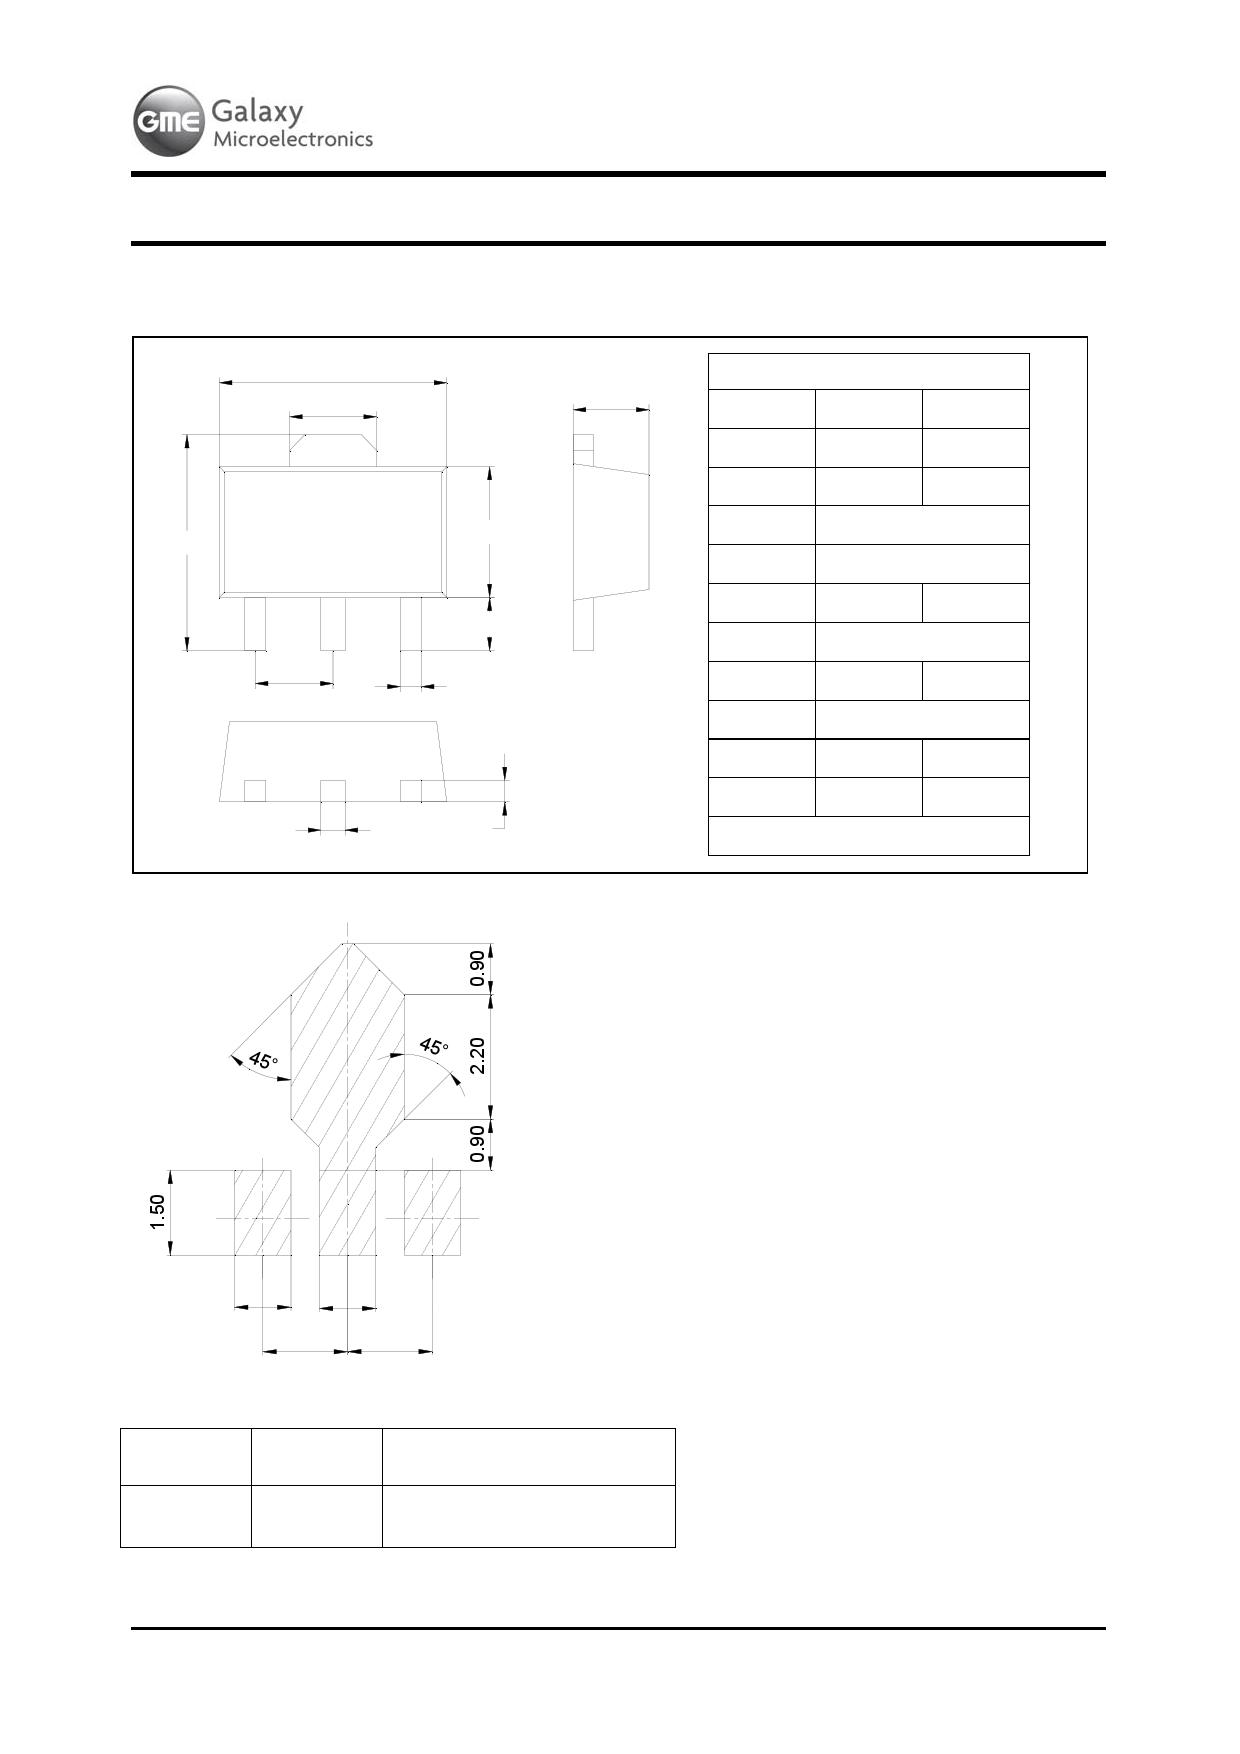 2SC4548 pdf, 반도체, 판매, 대치품